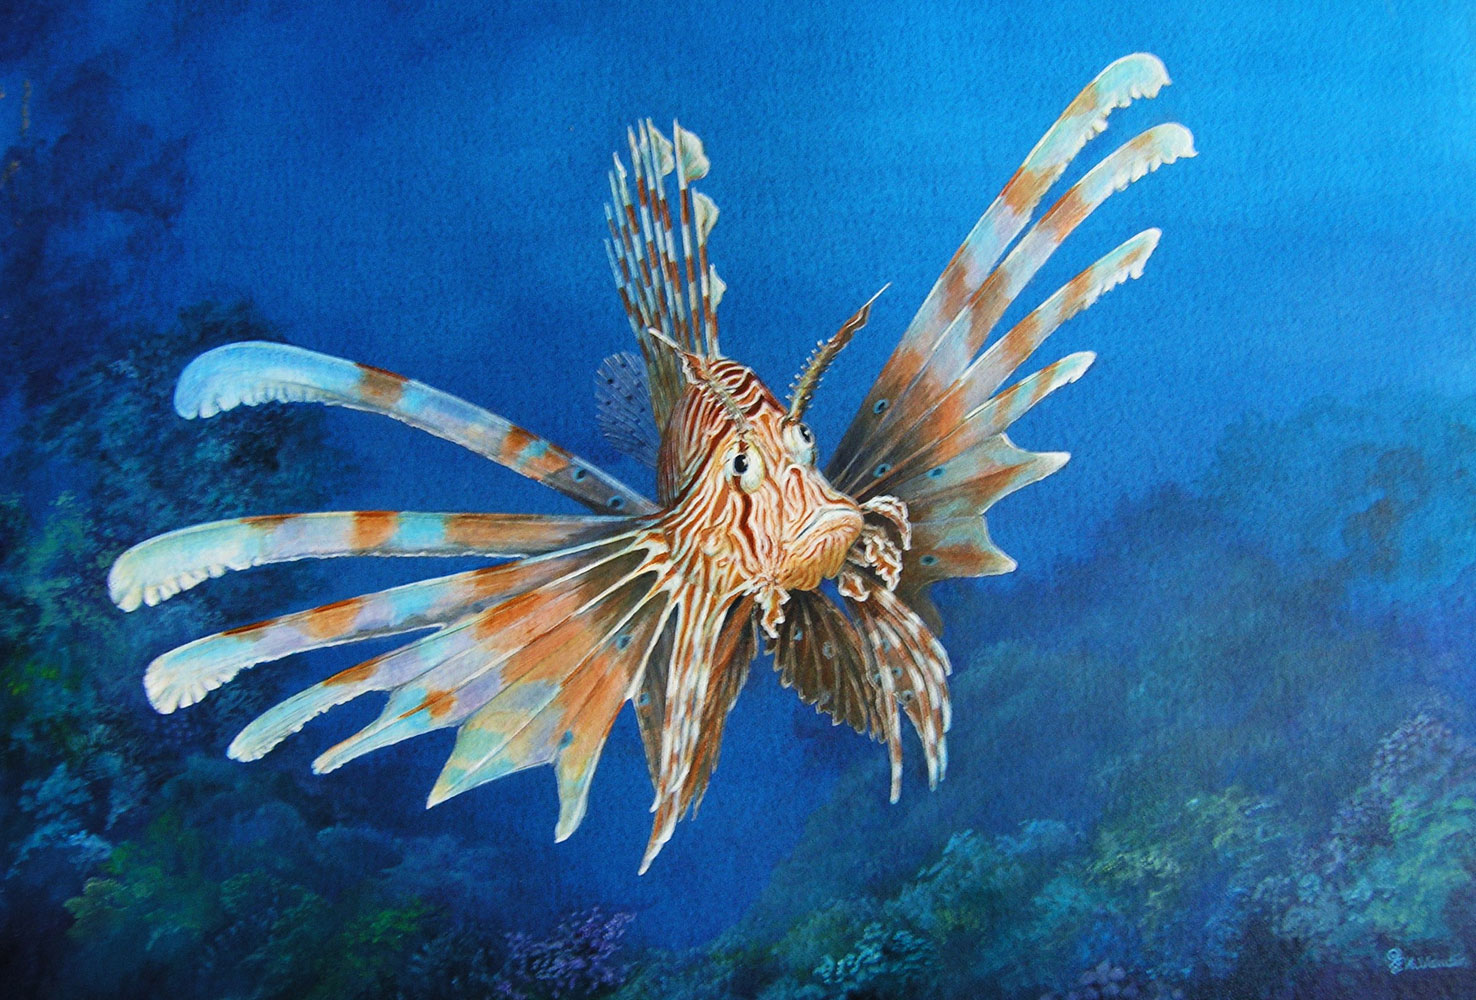 Lionfish Original Painting - Deep Impressions Underwater Art